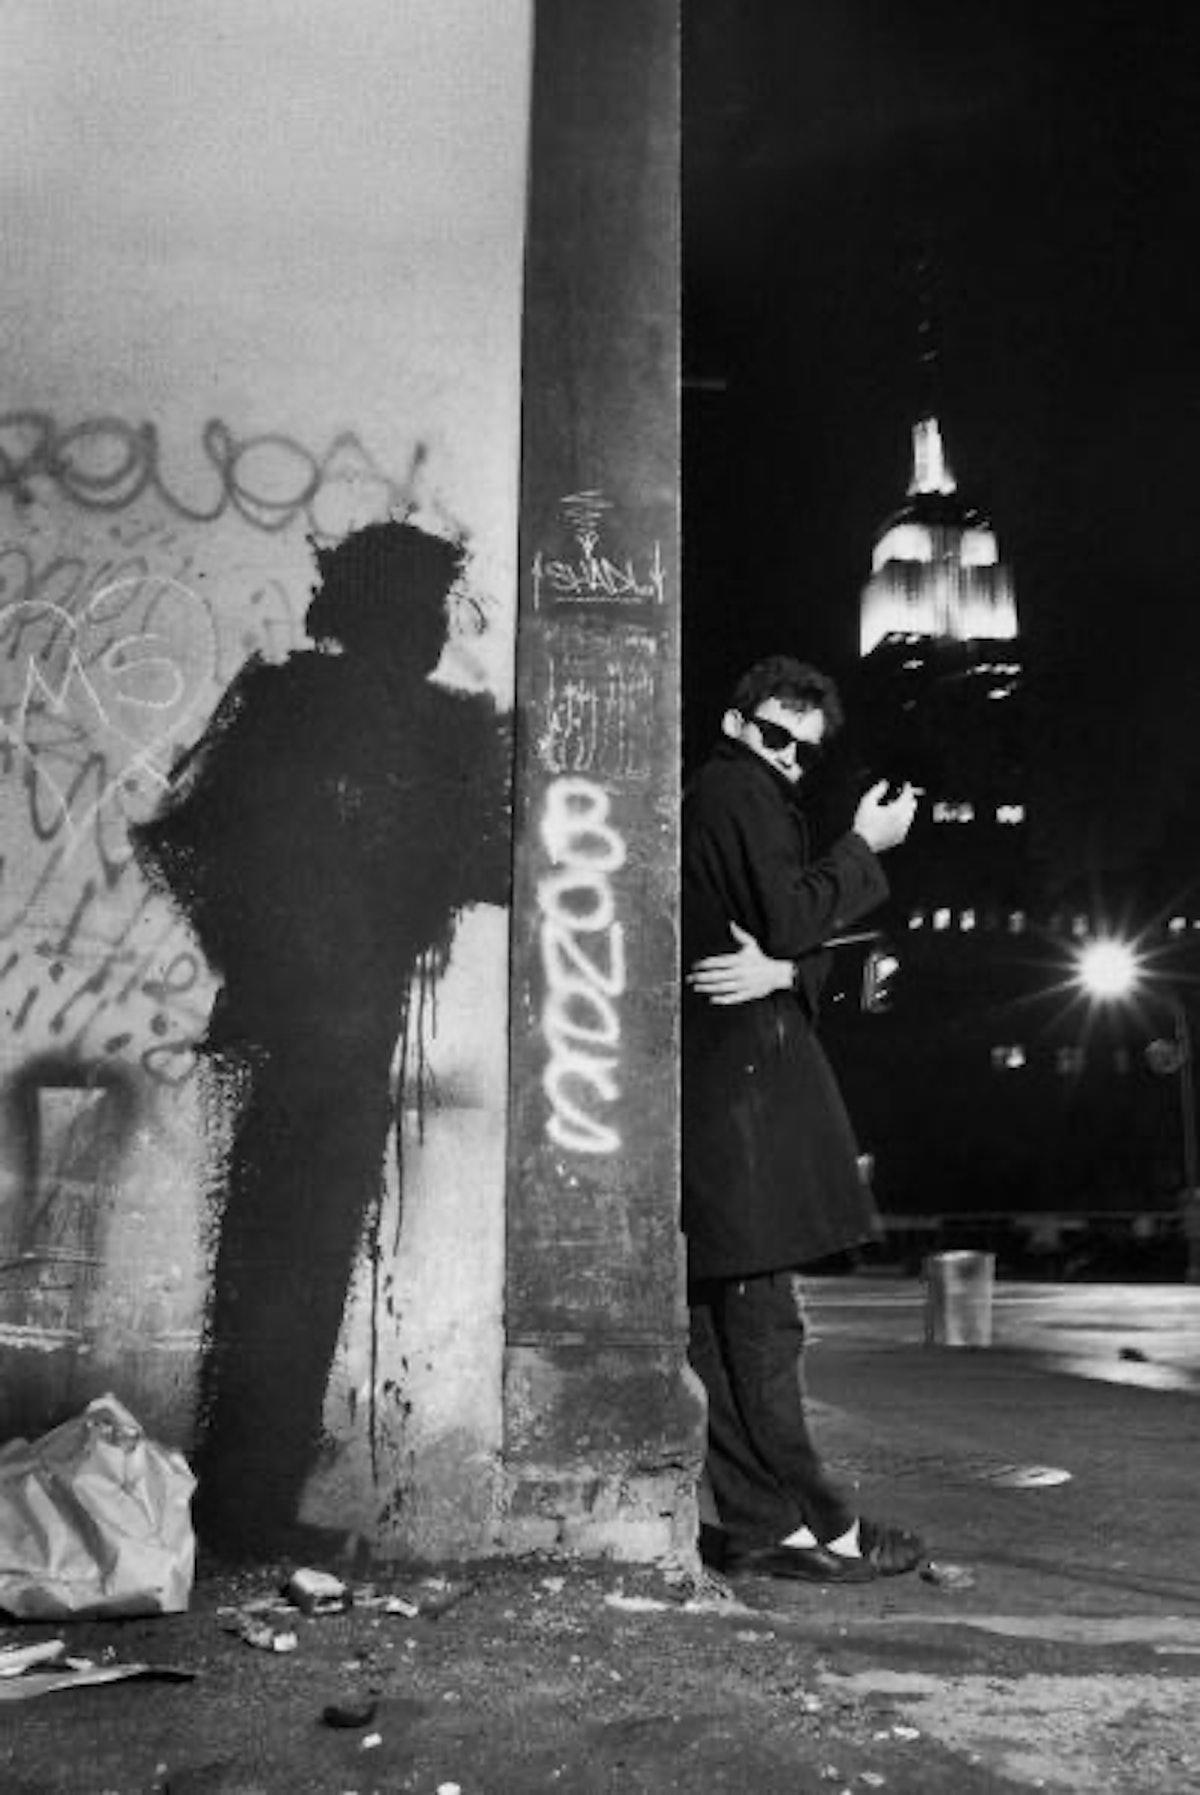 Artist Richard Hambleton outside at night with one